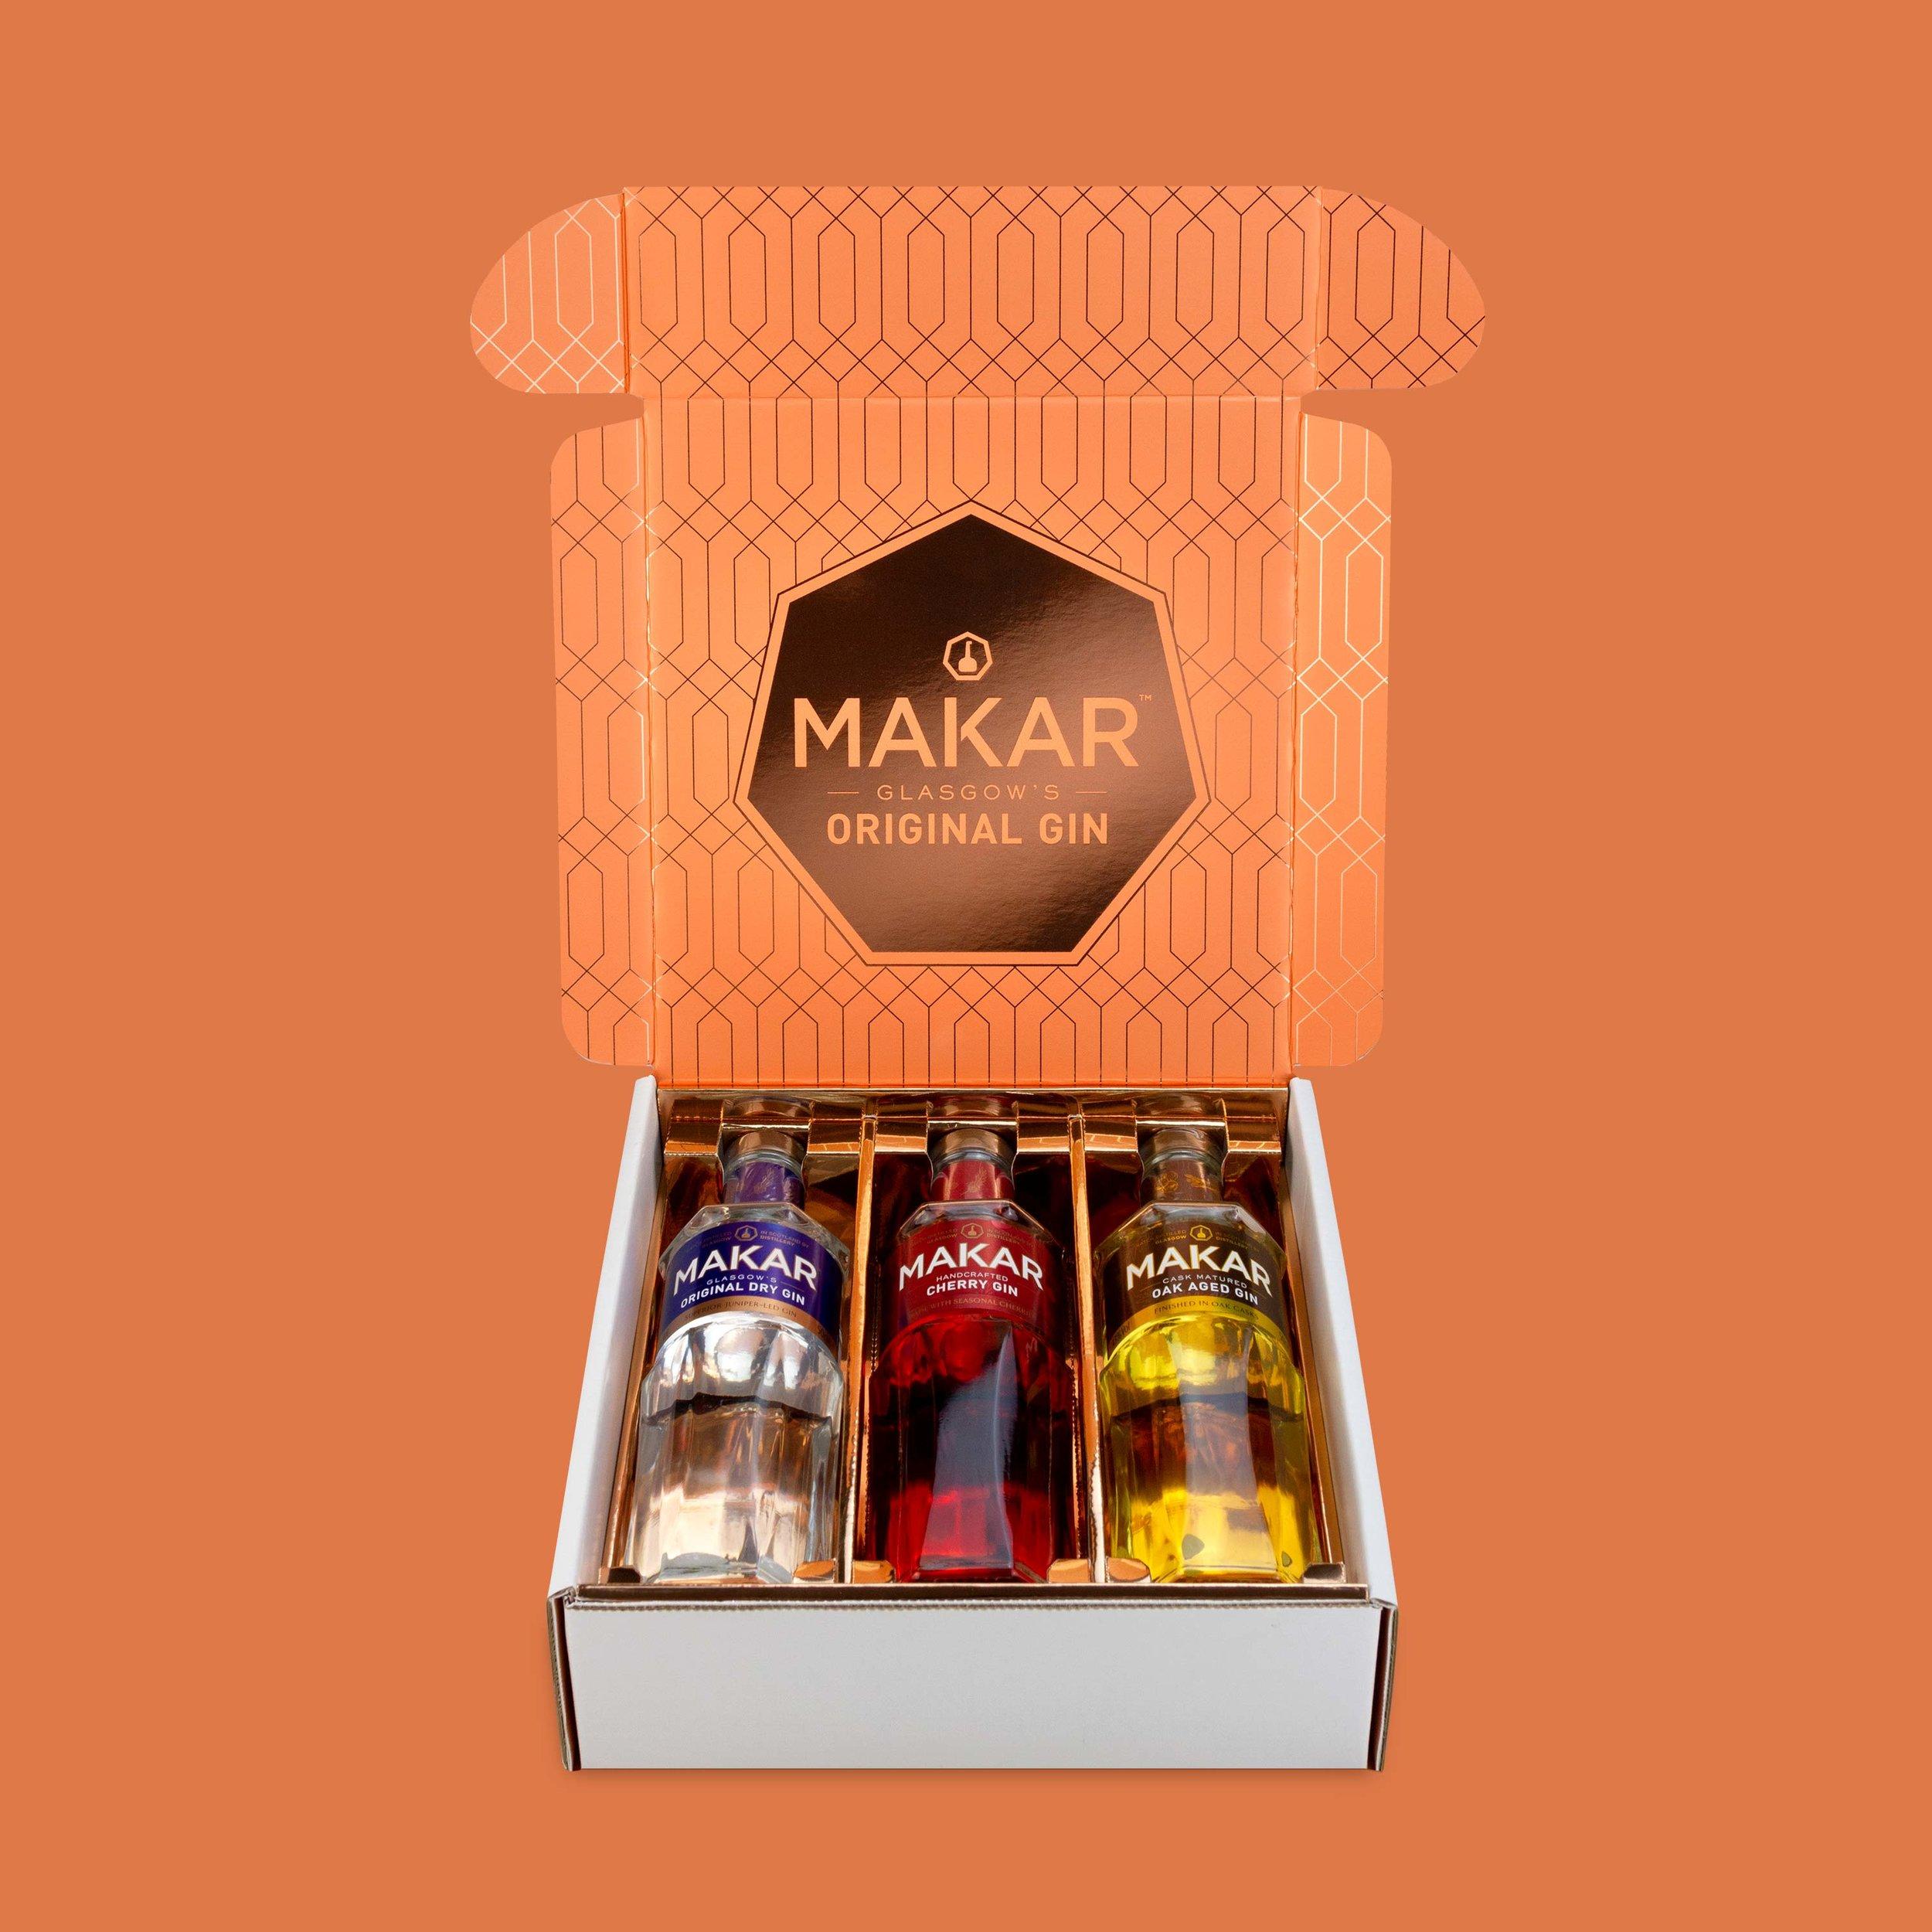 Makar-Gin-Wow-Box-Packaging-Design-Prototype-04.jpg